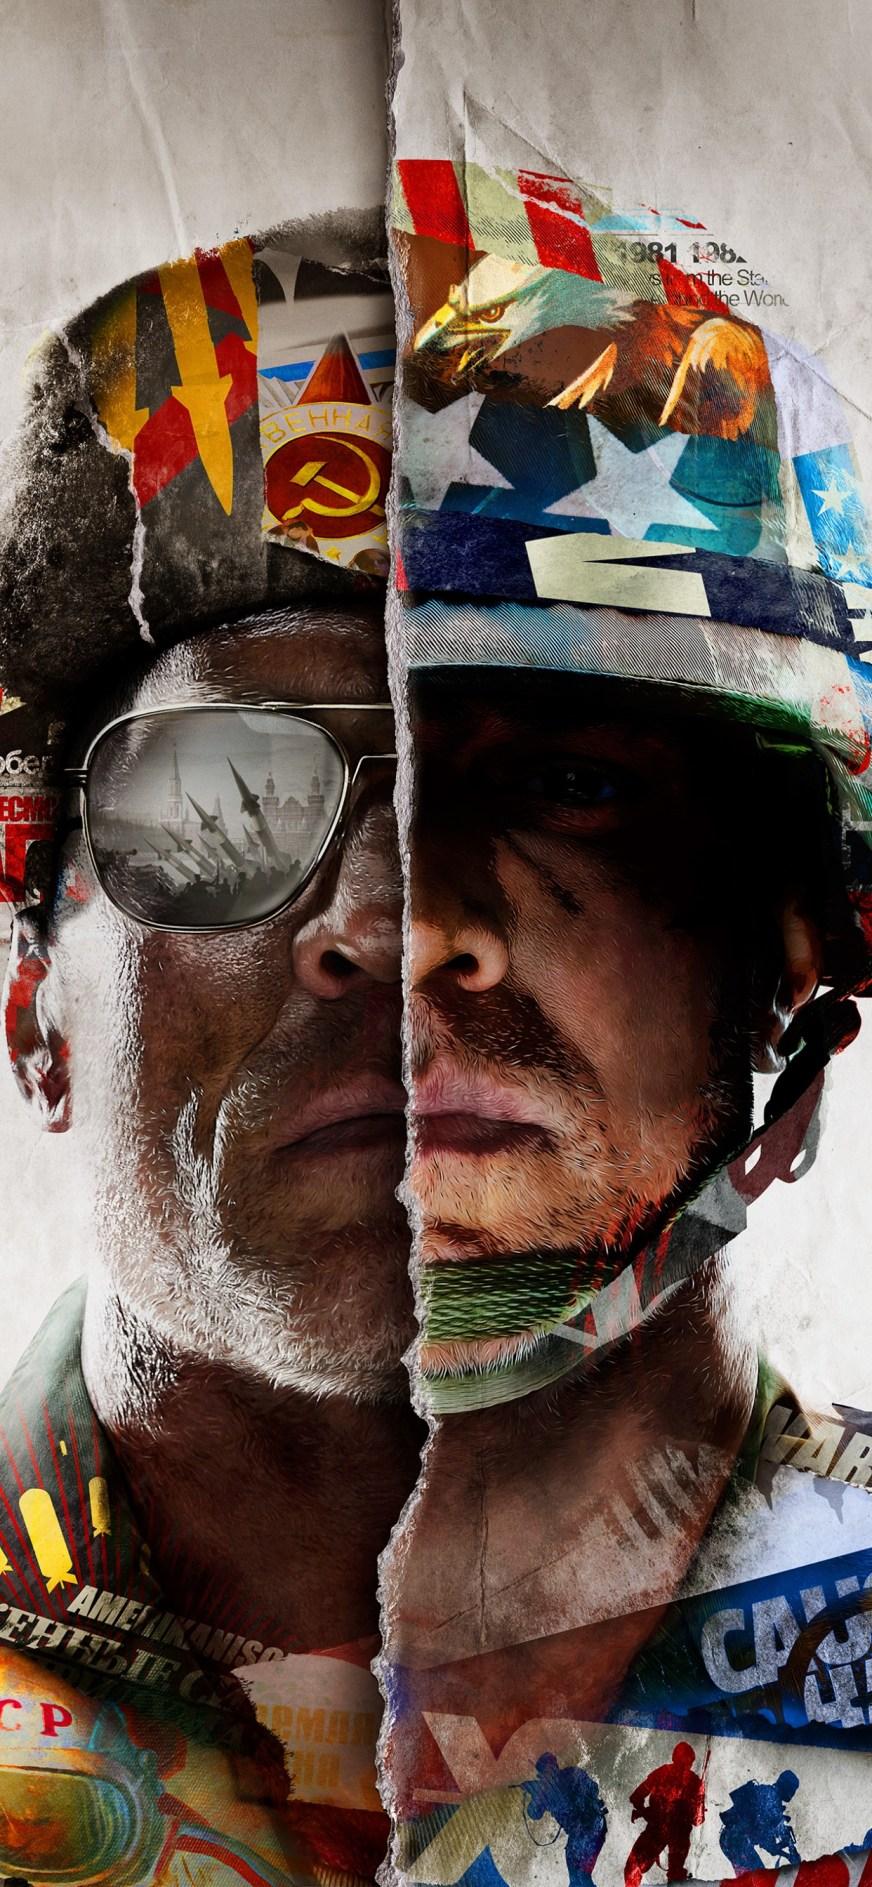 Call of Duty: Black Ops Cold War 4K Wallpaper, 2020 Games ...